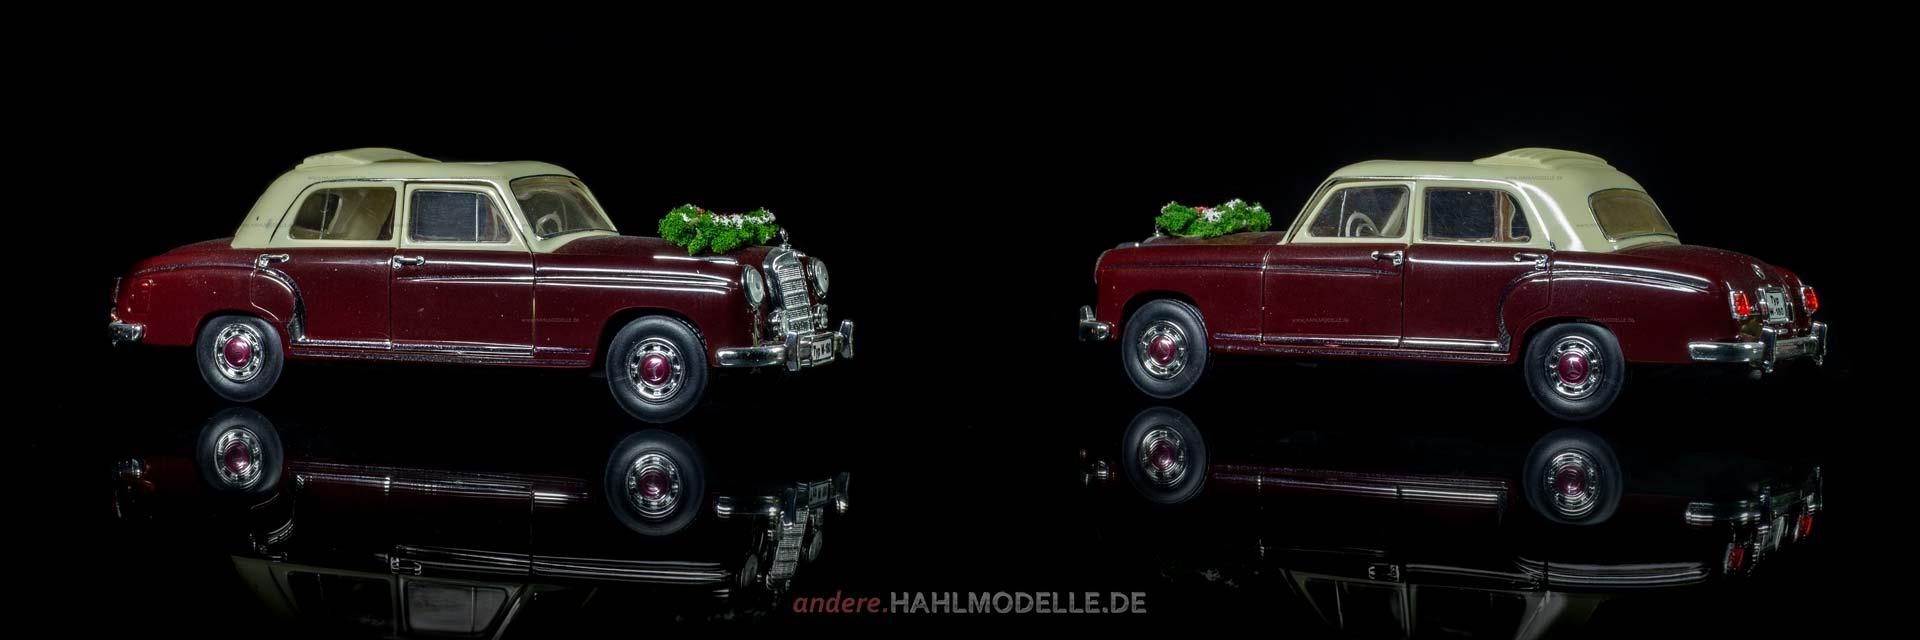 Mercedes-Benz 220 S (W 180) | Limousine | Faller | www.andere.hahlmodelle.de